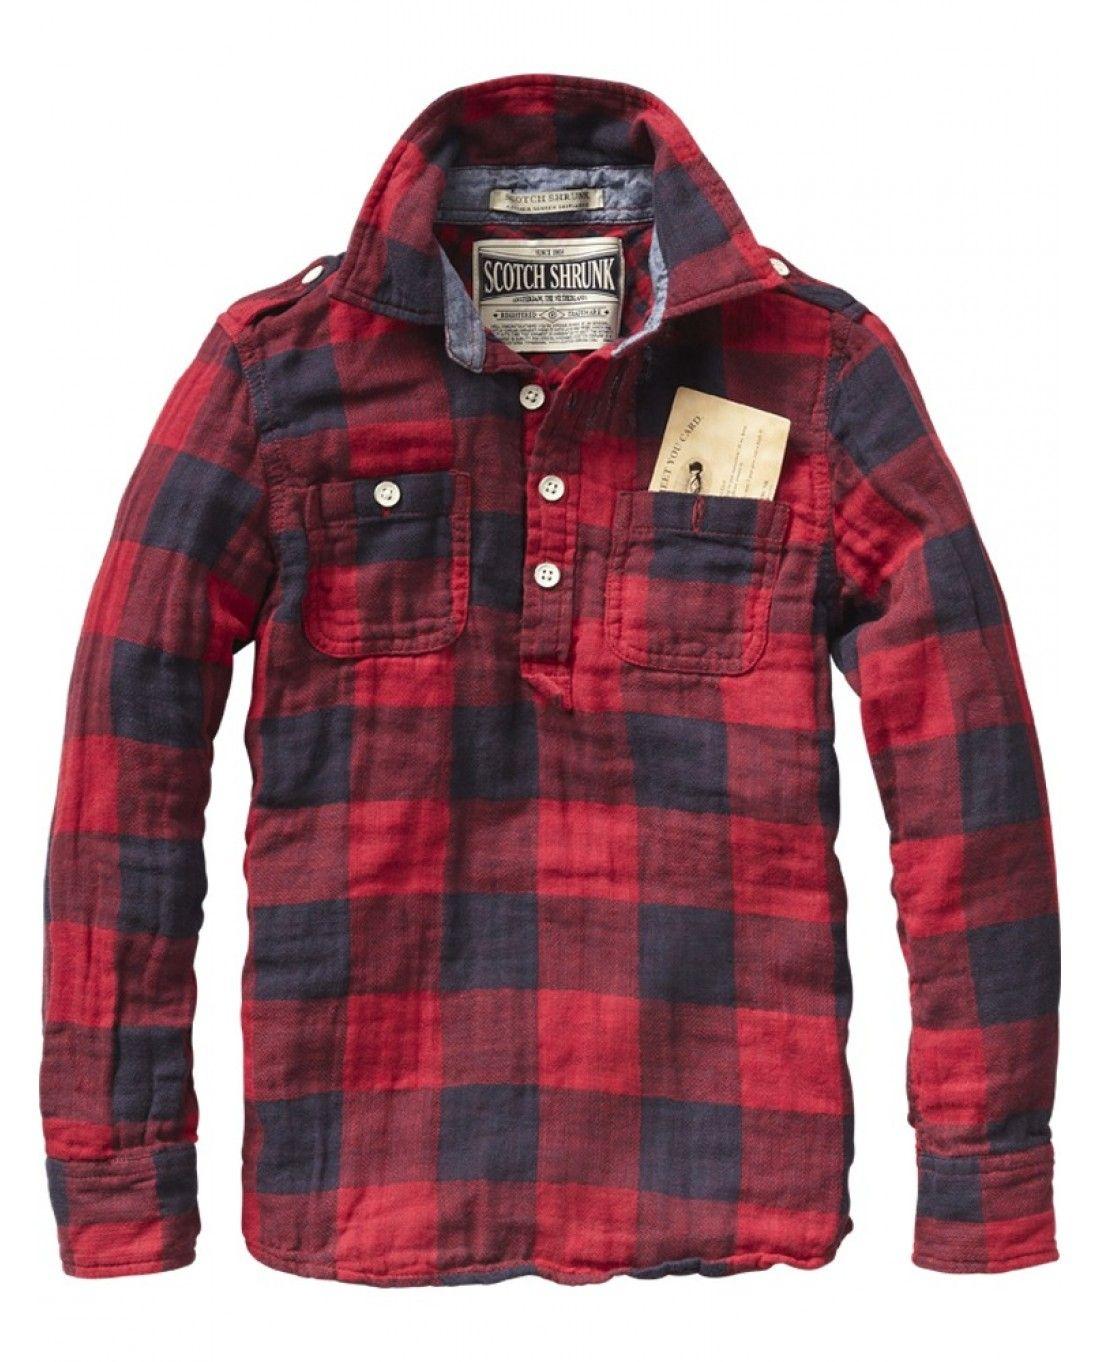 18 Soda Man Camisa And Scotch PlaidWnm Hombre Leñadora Otinv wkPO8n0